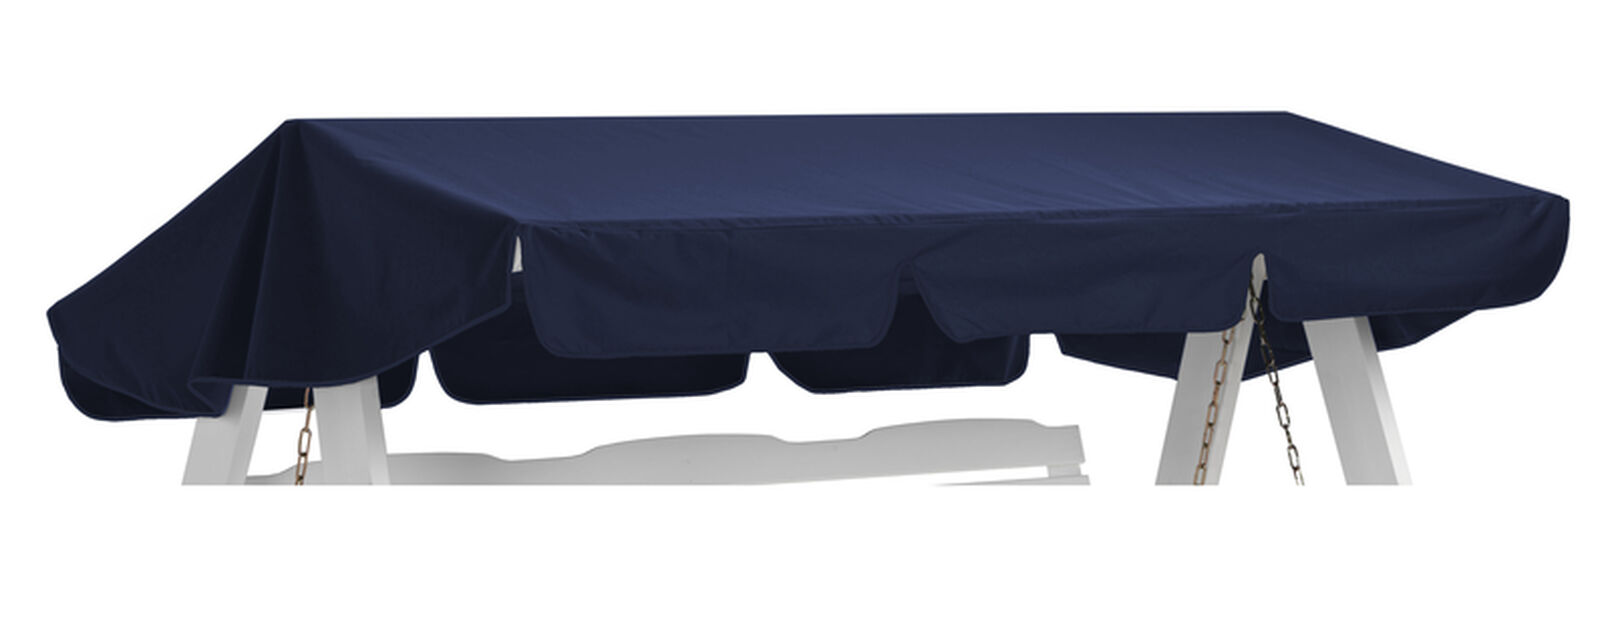 Hammocktak Dalom, Längd 191 cm, Marinblå